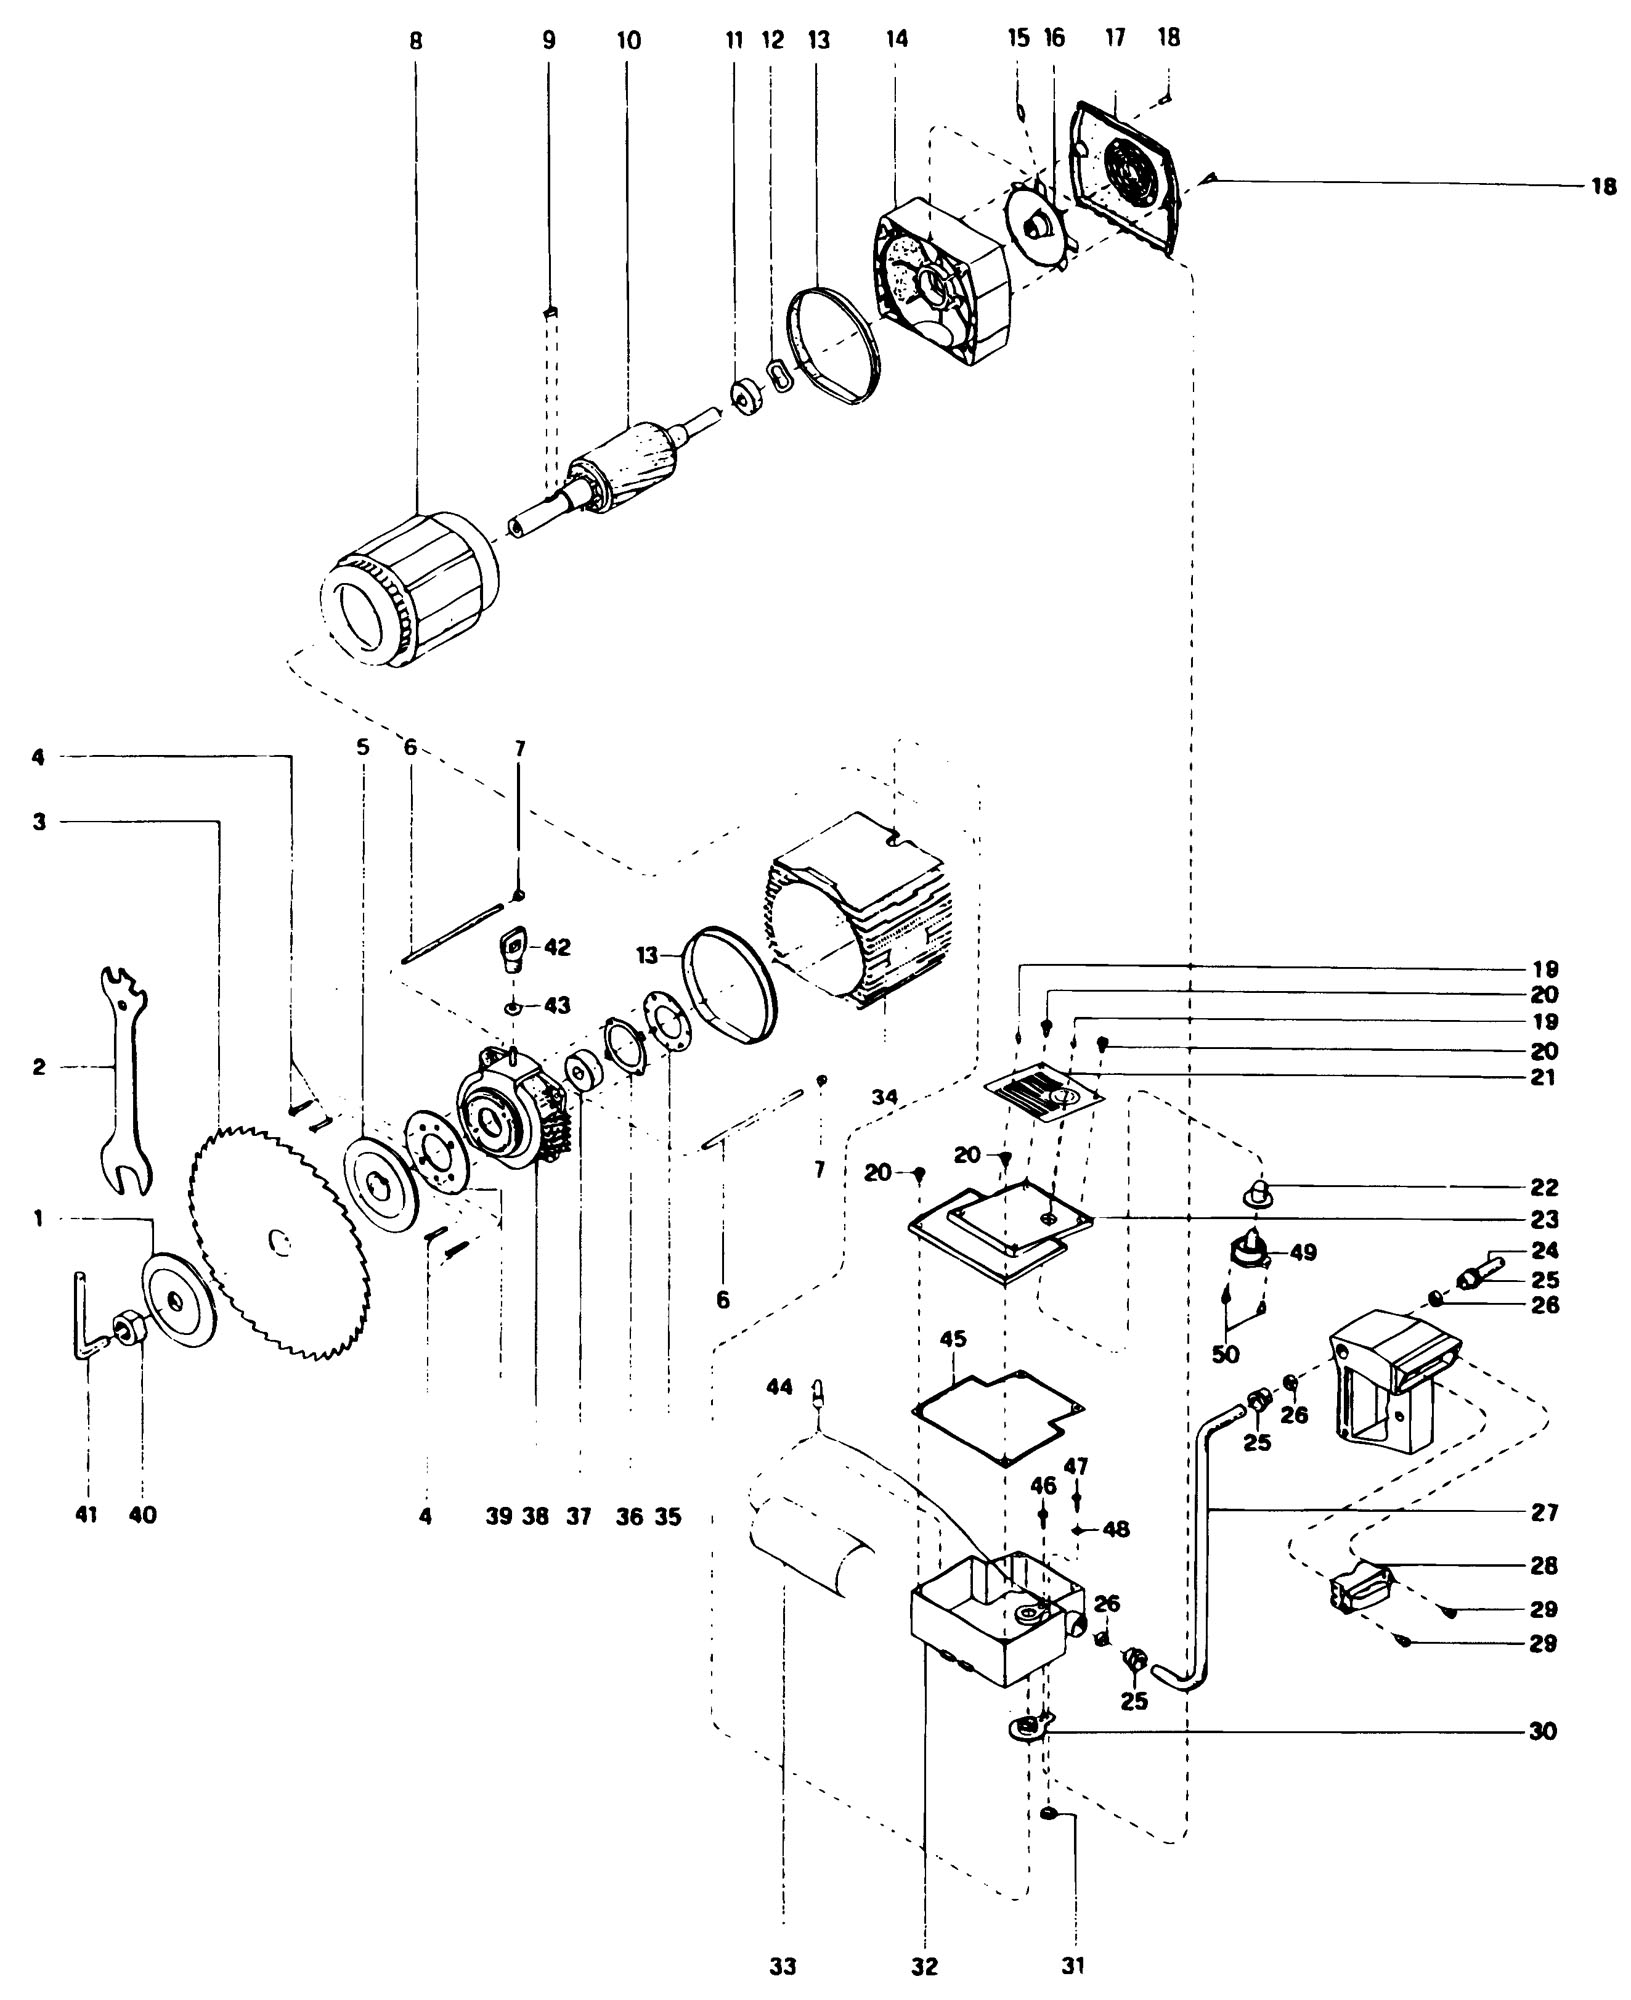 A Craftsman Radial Arm Saw Wiring